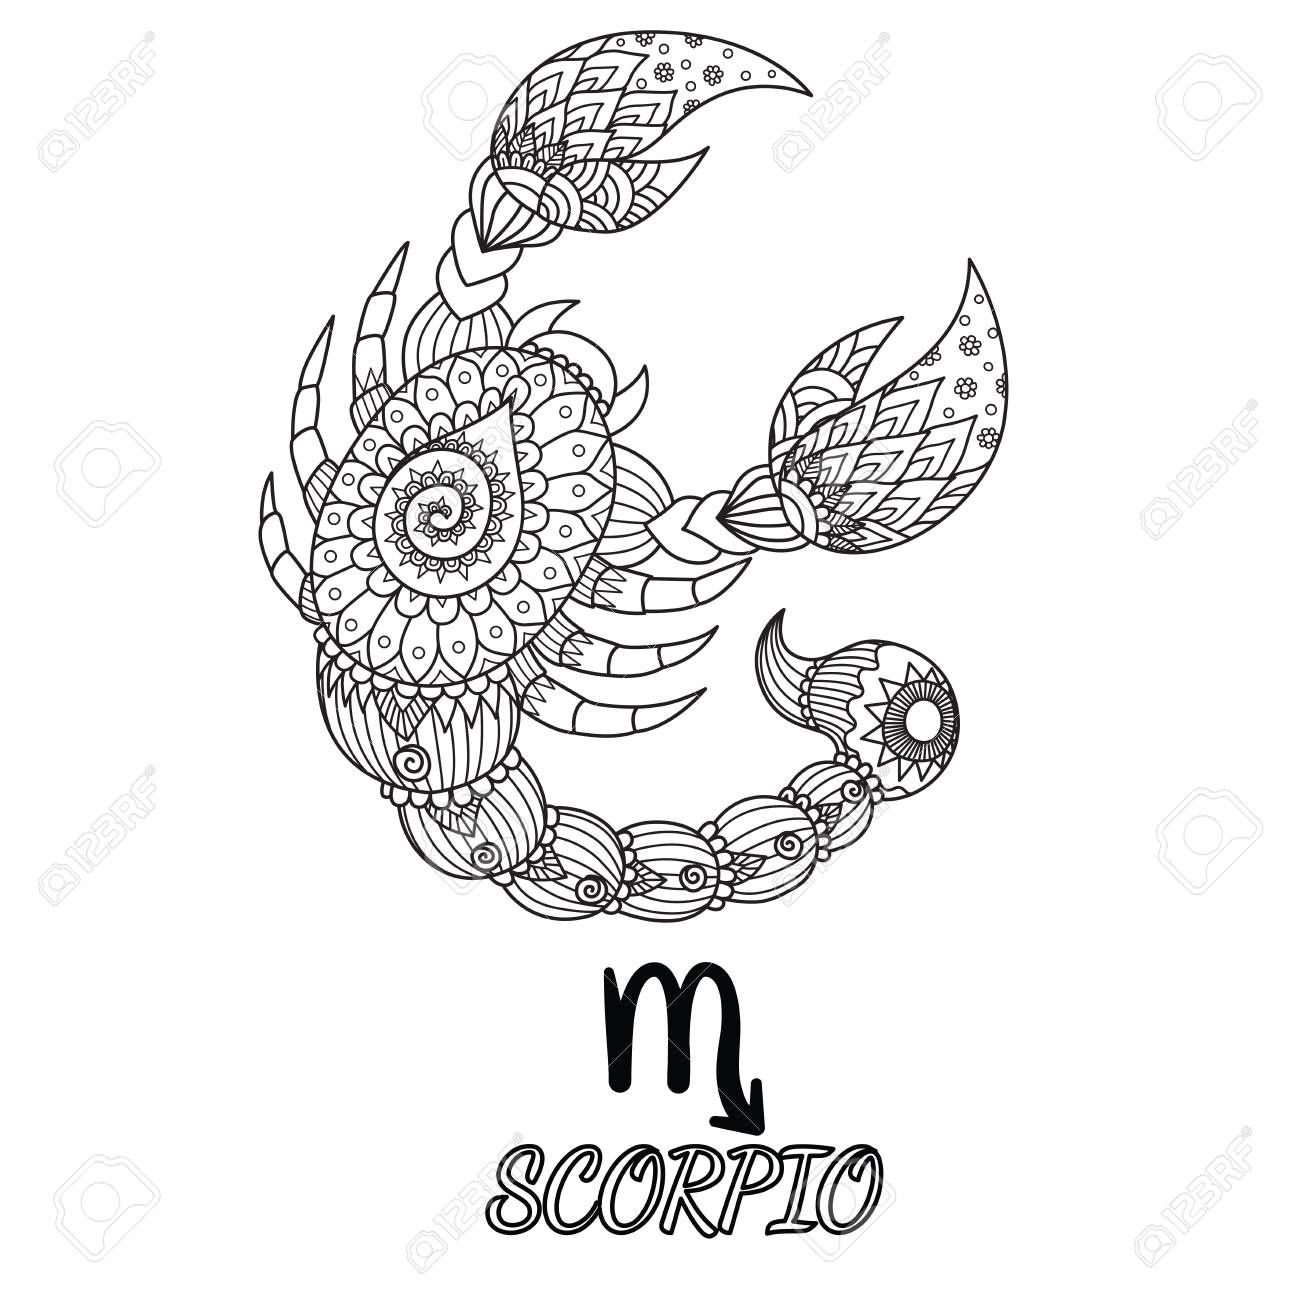 Scorpio Zodiac Horoscope Constellation Sign Symbol Tattoo (74)